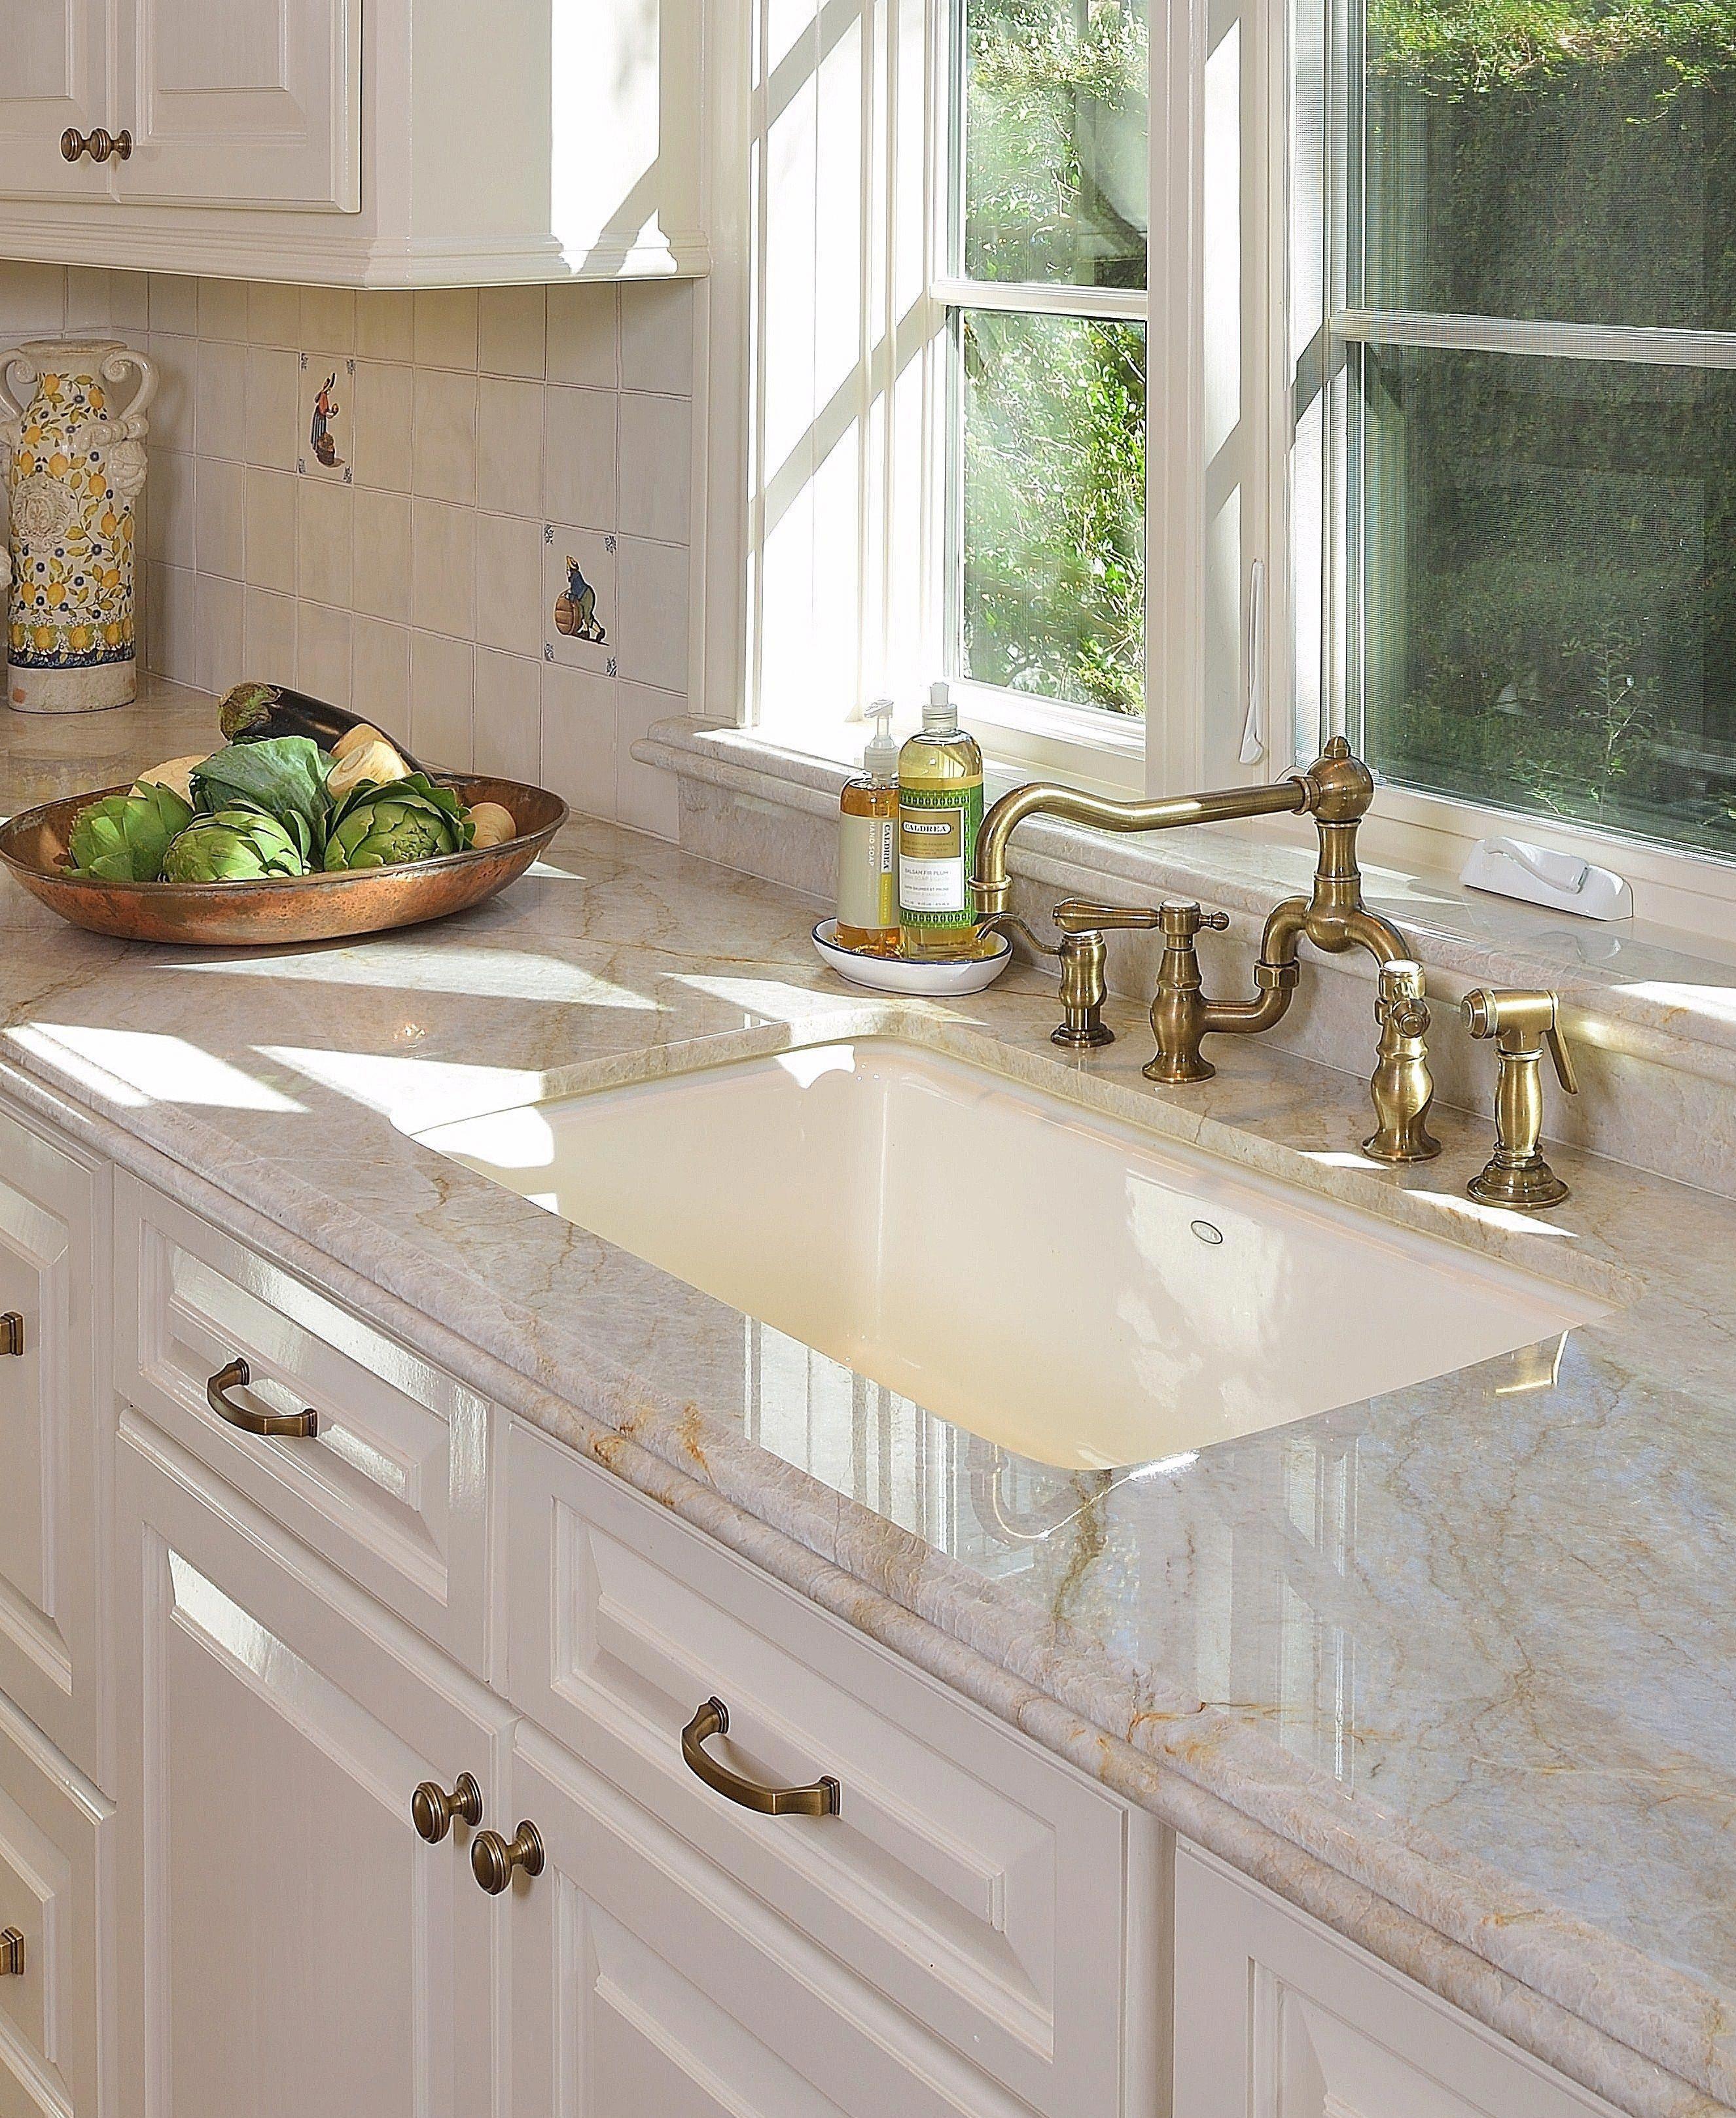 brass rohl tajmahalquartzite taj mahal quartzite countertop selected for its cr in 2020 on outdoor kitchen quartzite id=11664